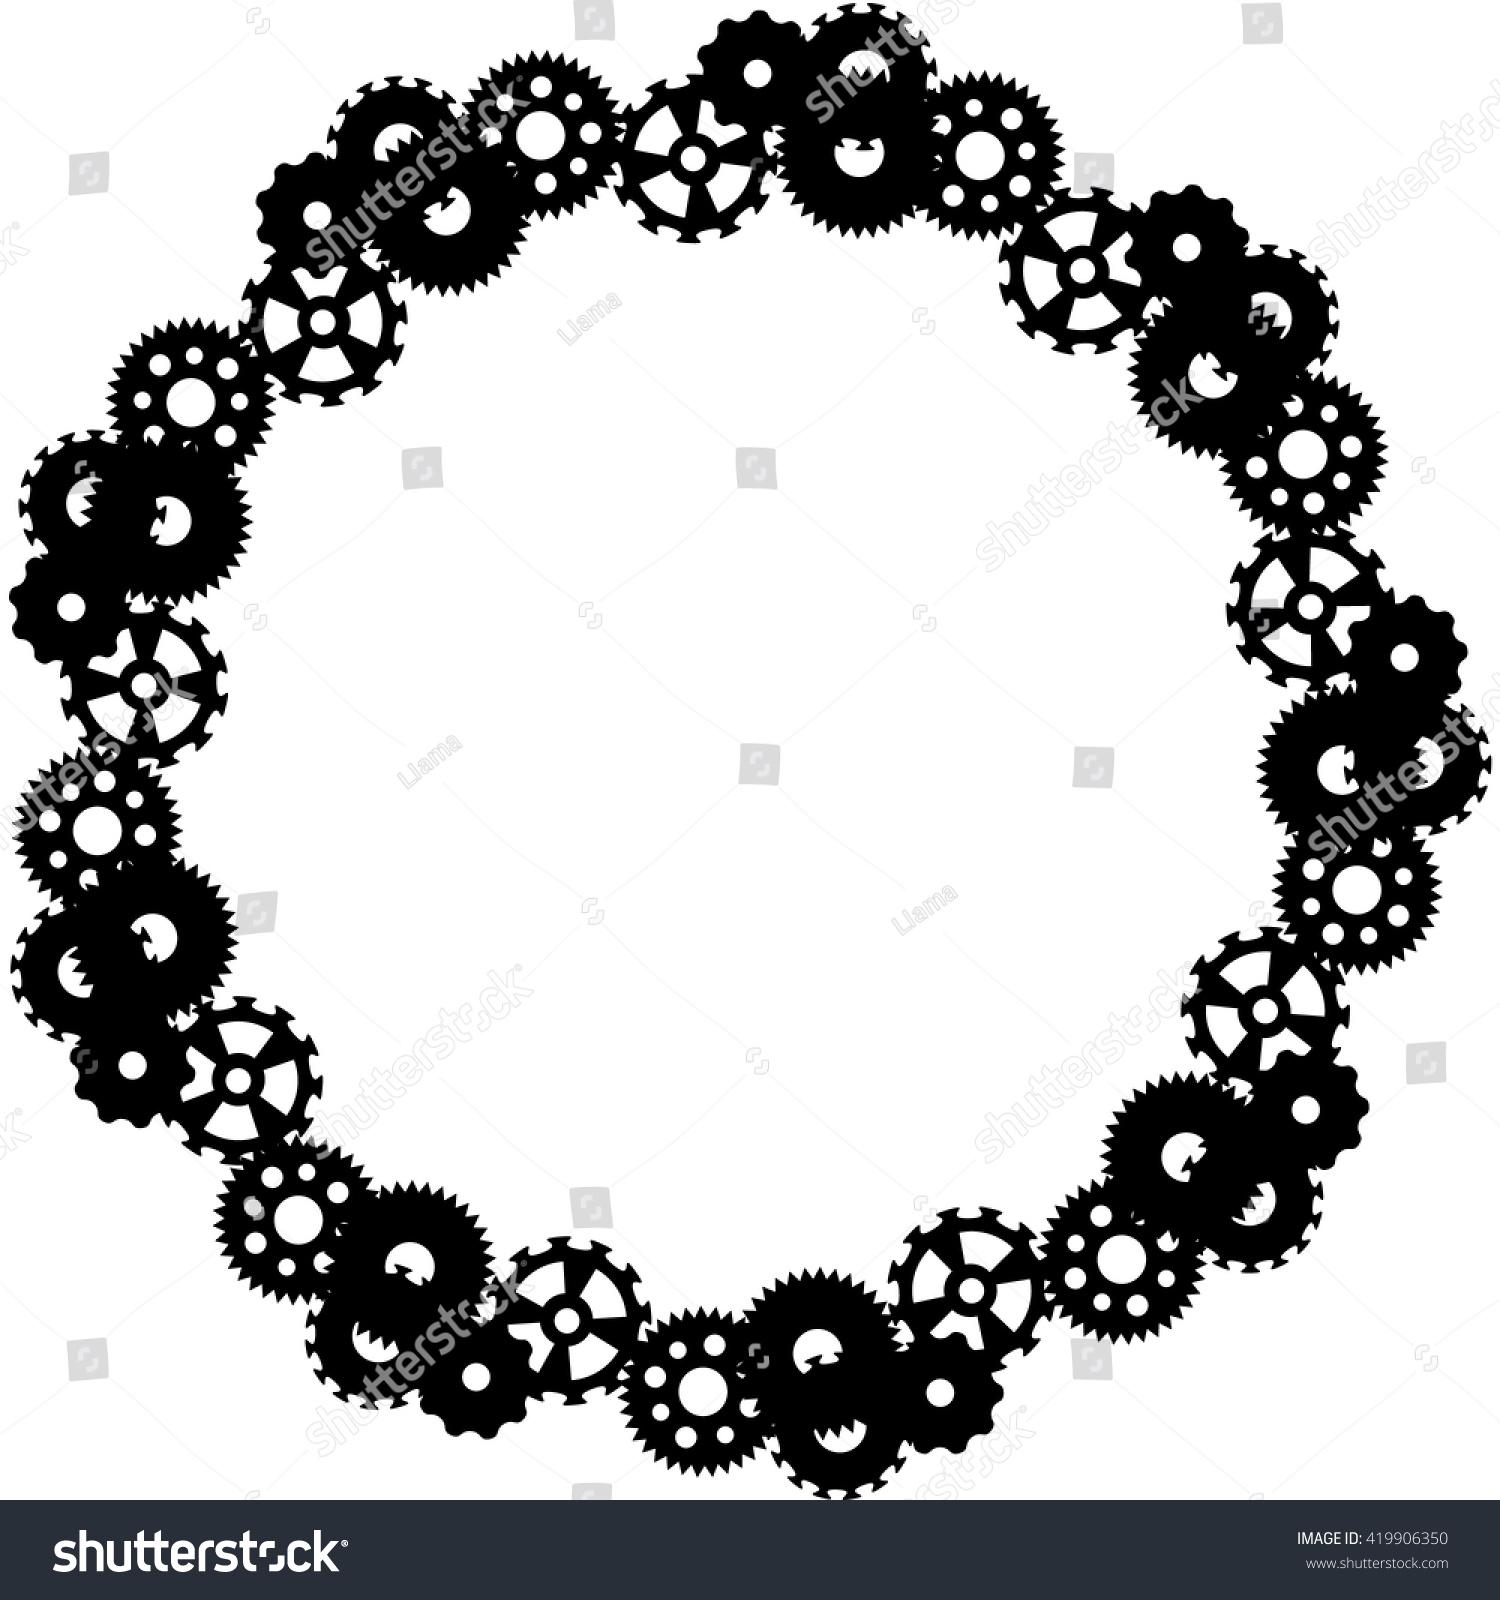 Steampunk Round Frame Gears Vector Stock Vector 419906350 - Shutterstock